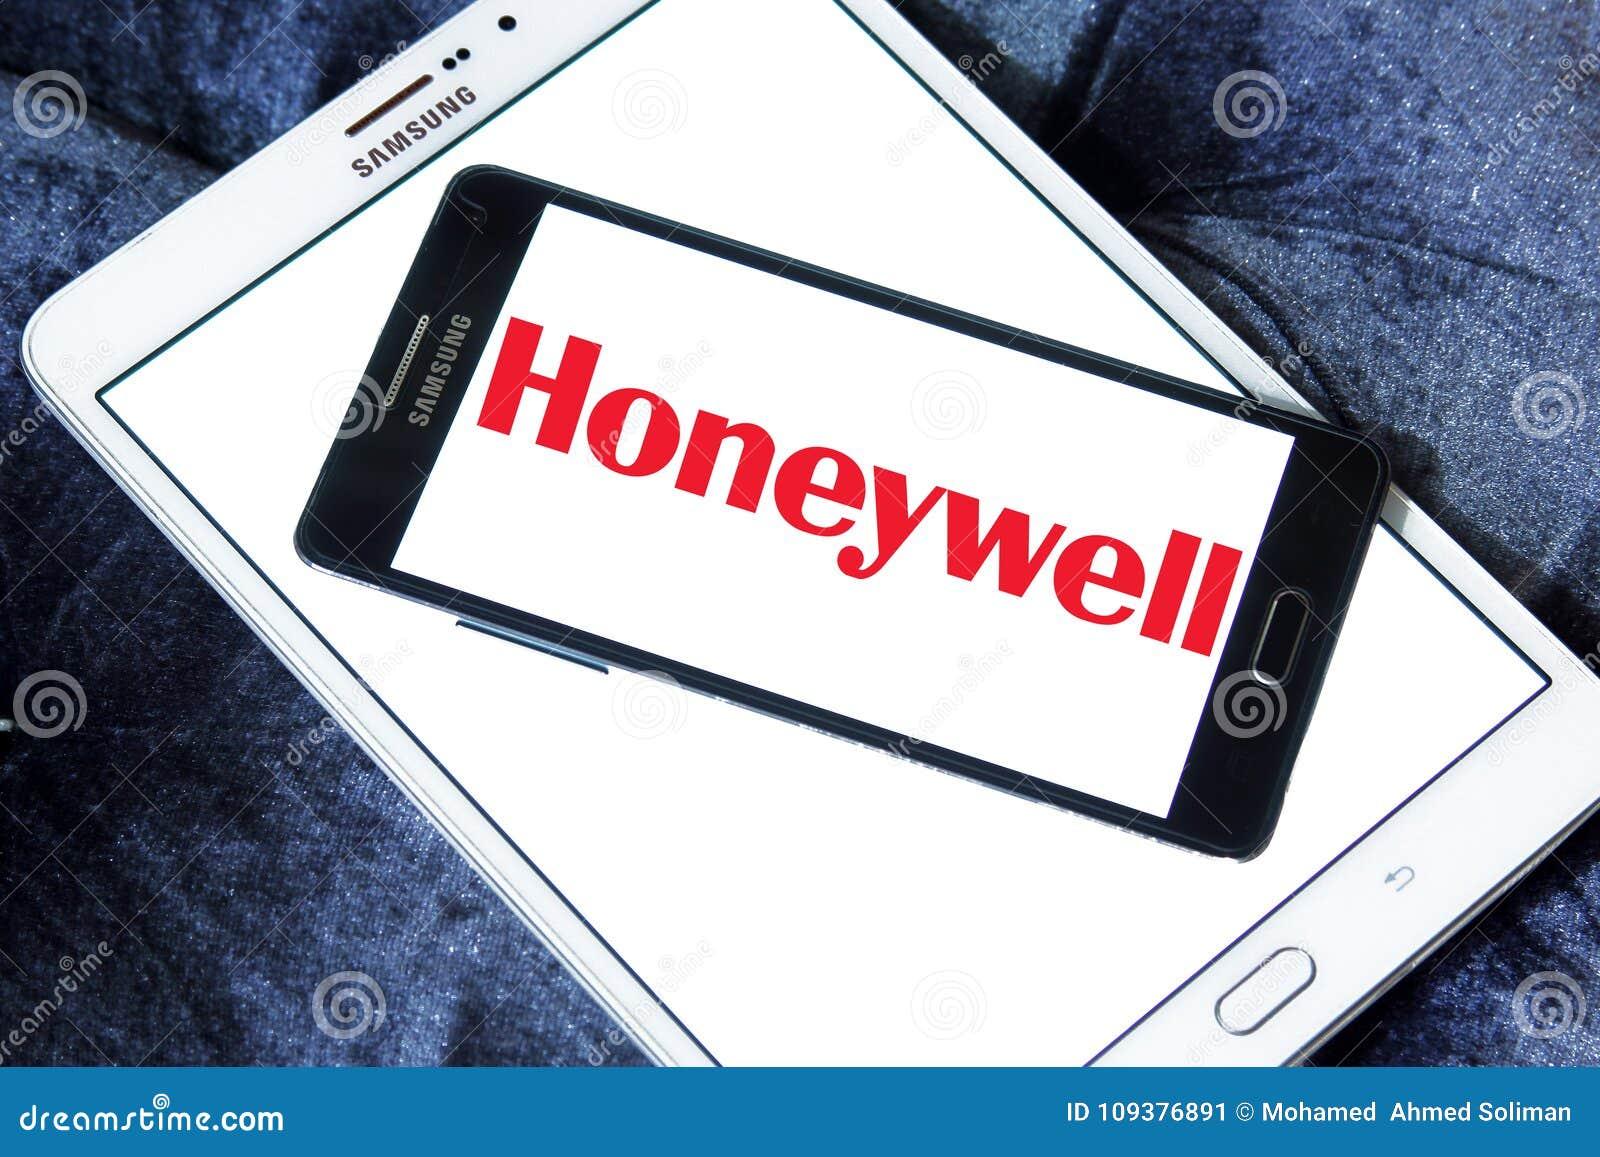 Honeywell company logo editorial photo  Image of products